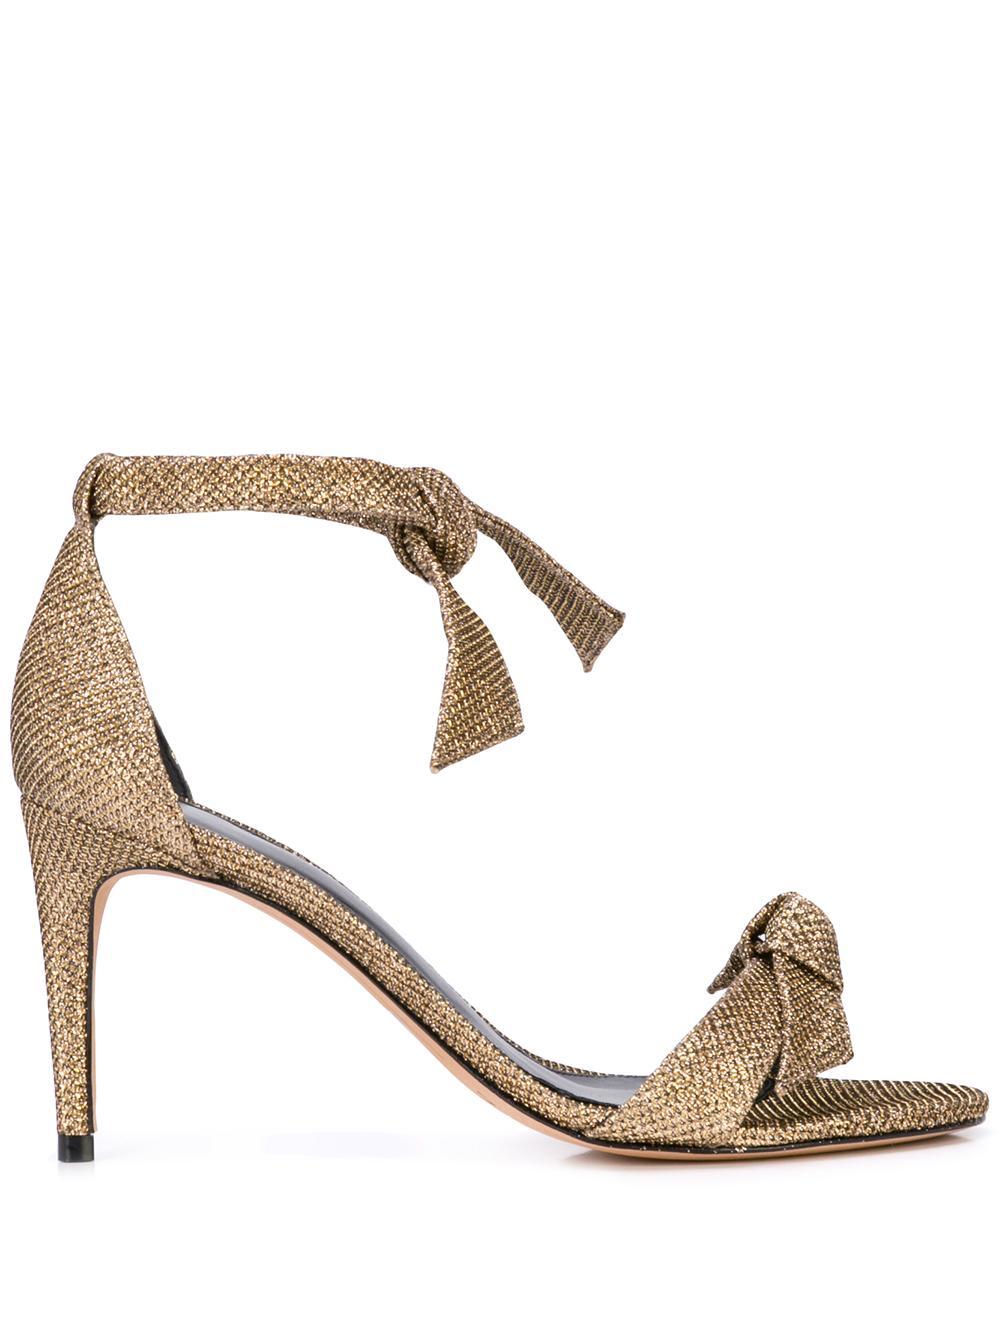 Clarita 75mm Metallic Sandal